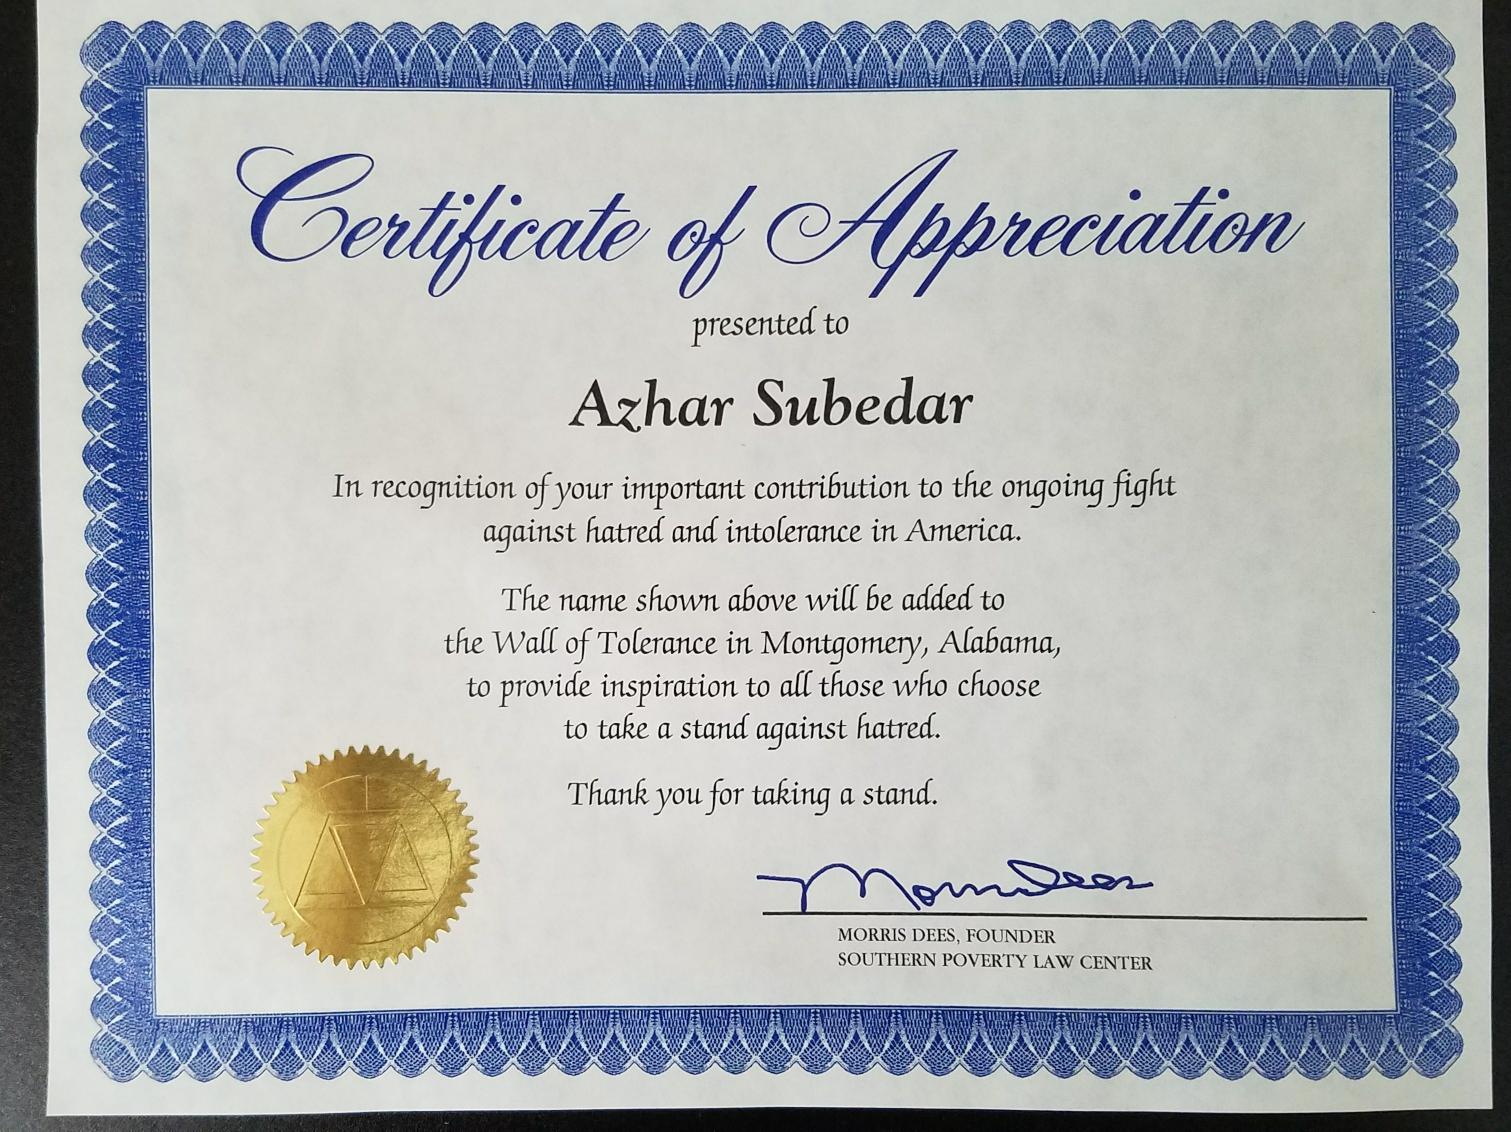 Founder Of South Poverty Law Center Awards Imam Azhar